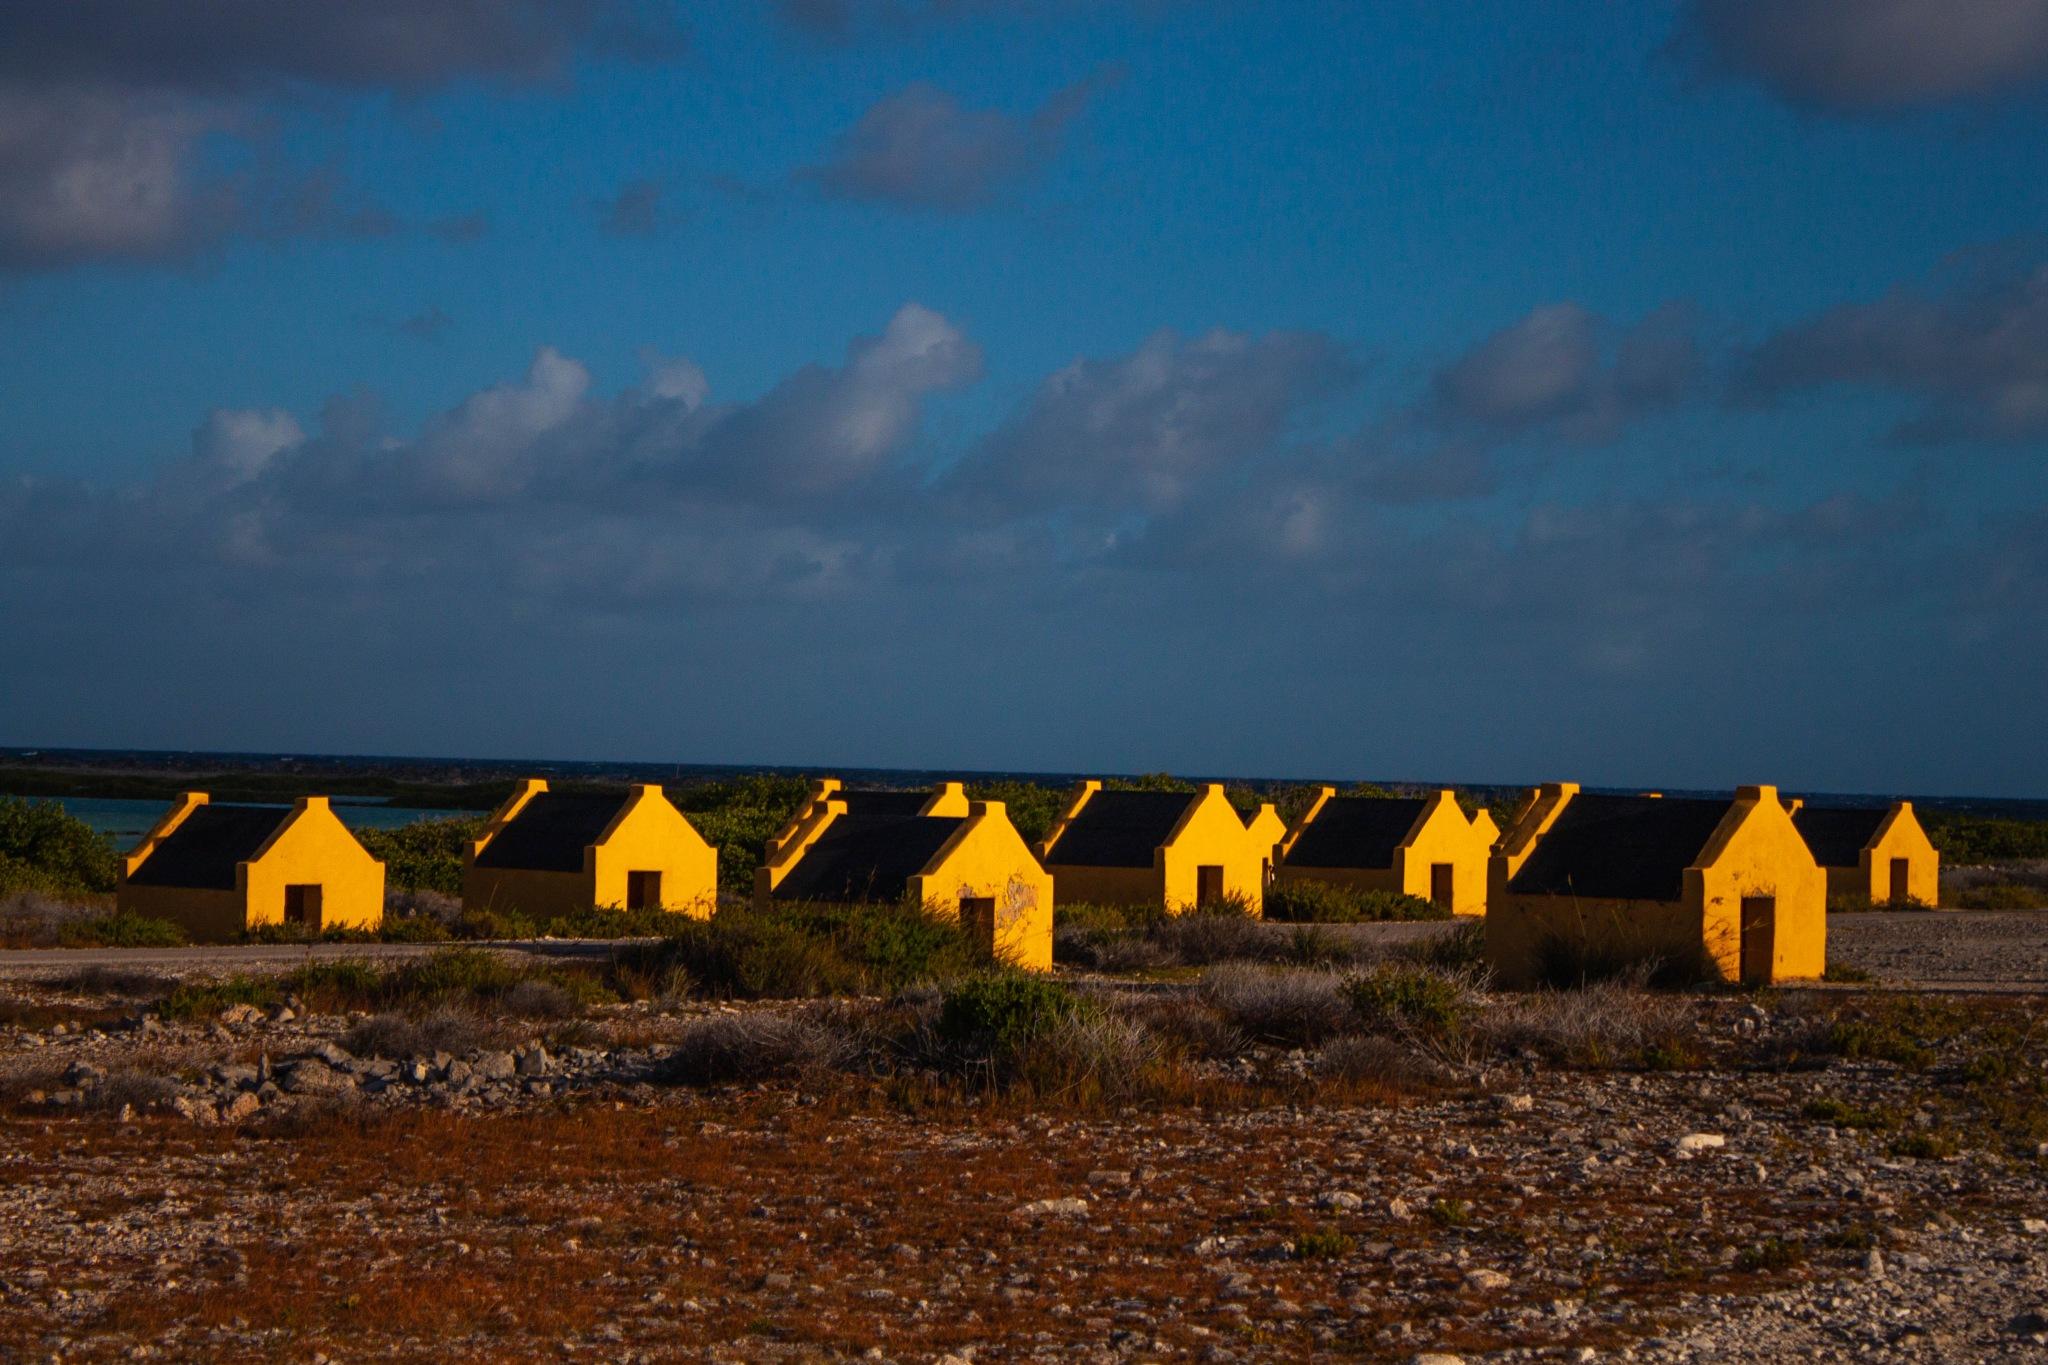 Orange Slave Houses Part 2 by Dimphy Deitmers